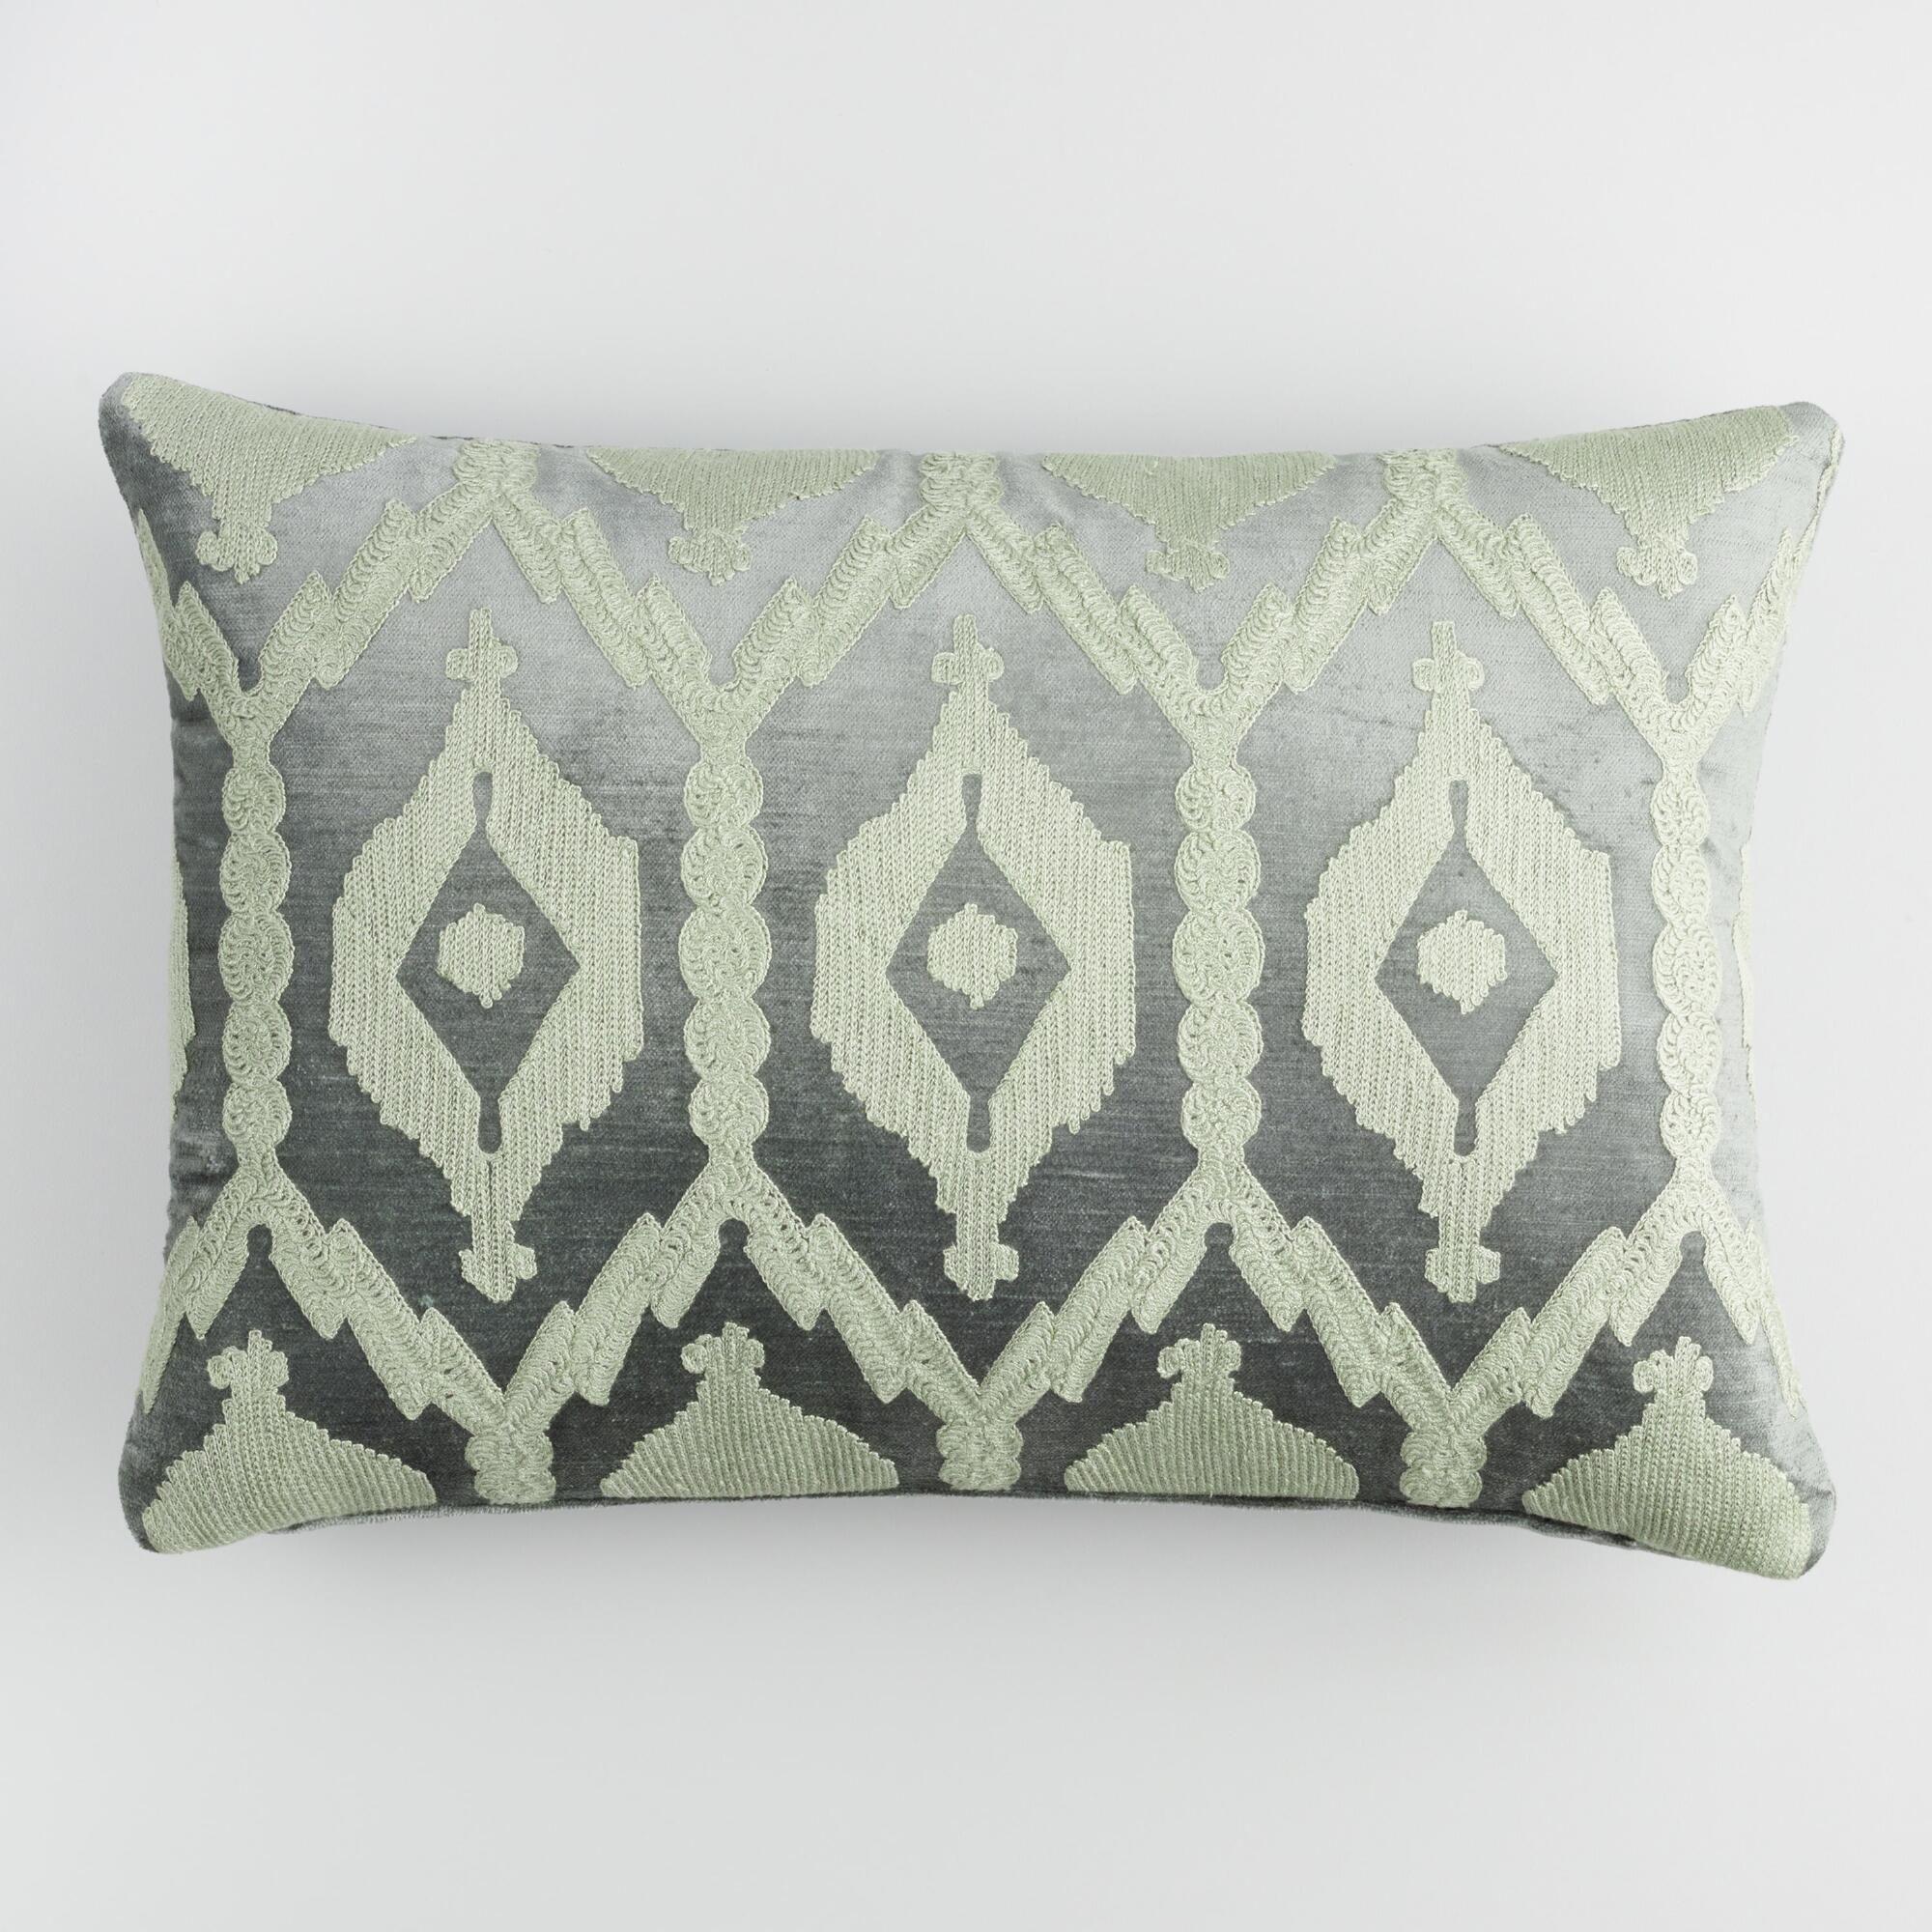 Frost Green Embroidered Velvet Lumbar Pillow by World Market